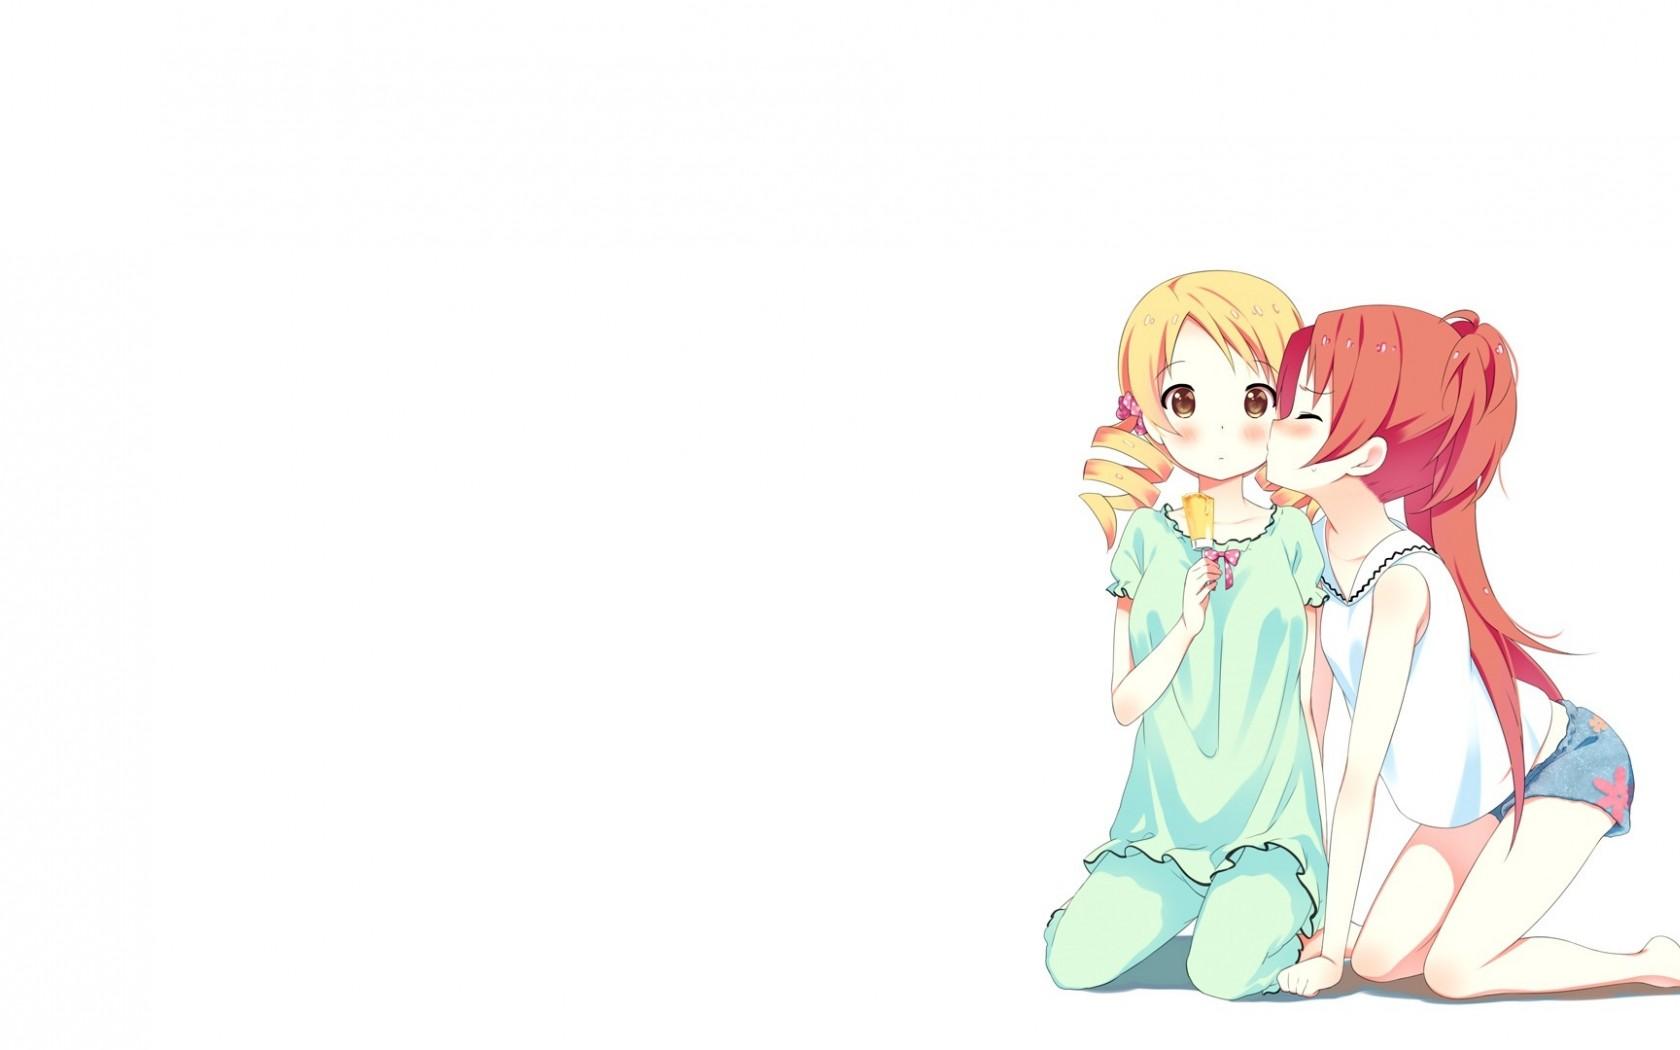 pre_1441284423__anime-devushka-loli-poce